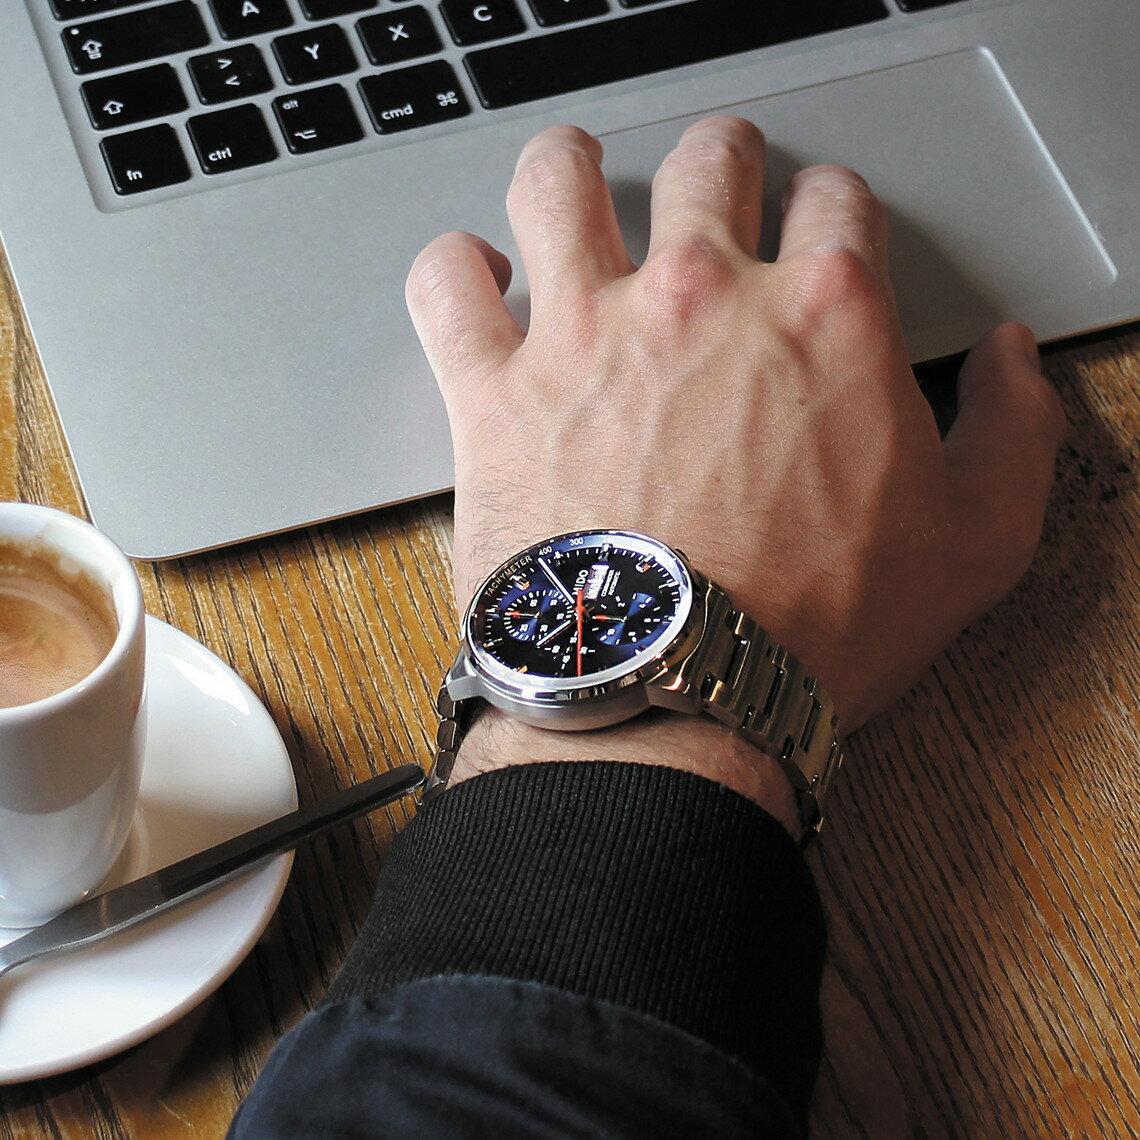 MIDO 美度 M0164141104100 Commander 指揮官系列機械腕錶 藍 銀 42.5mm 3